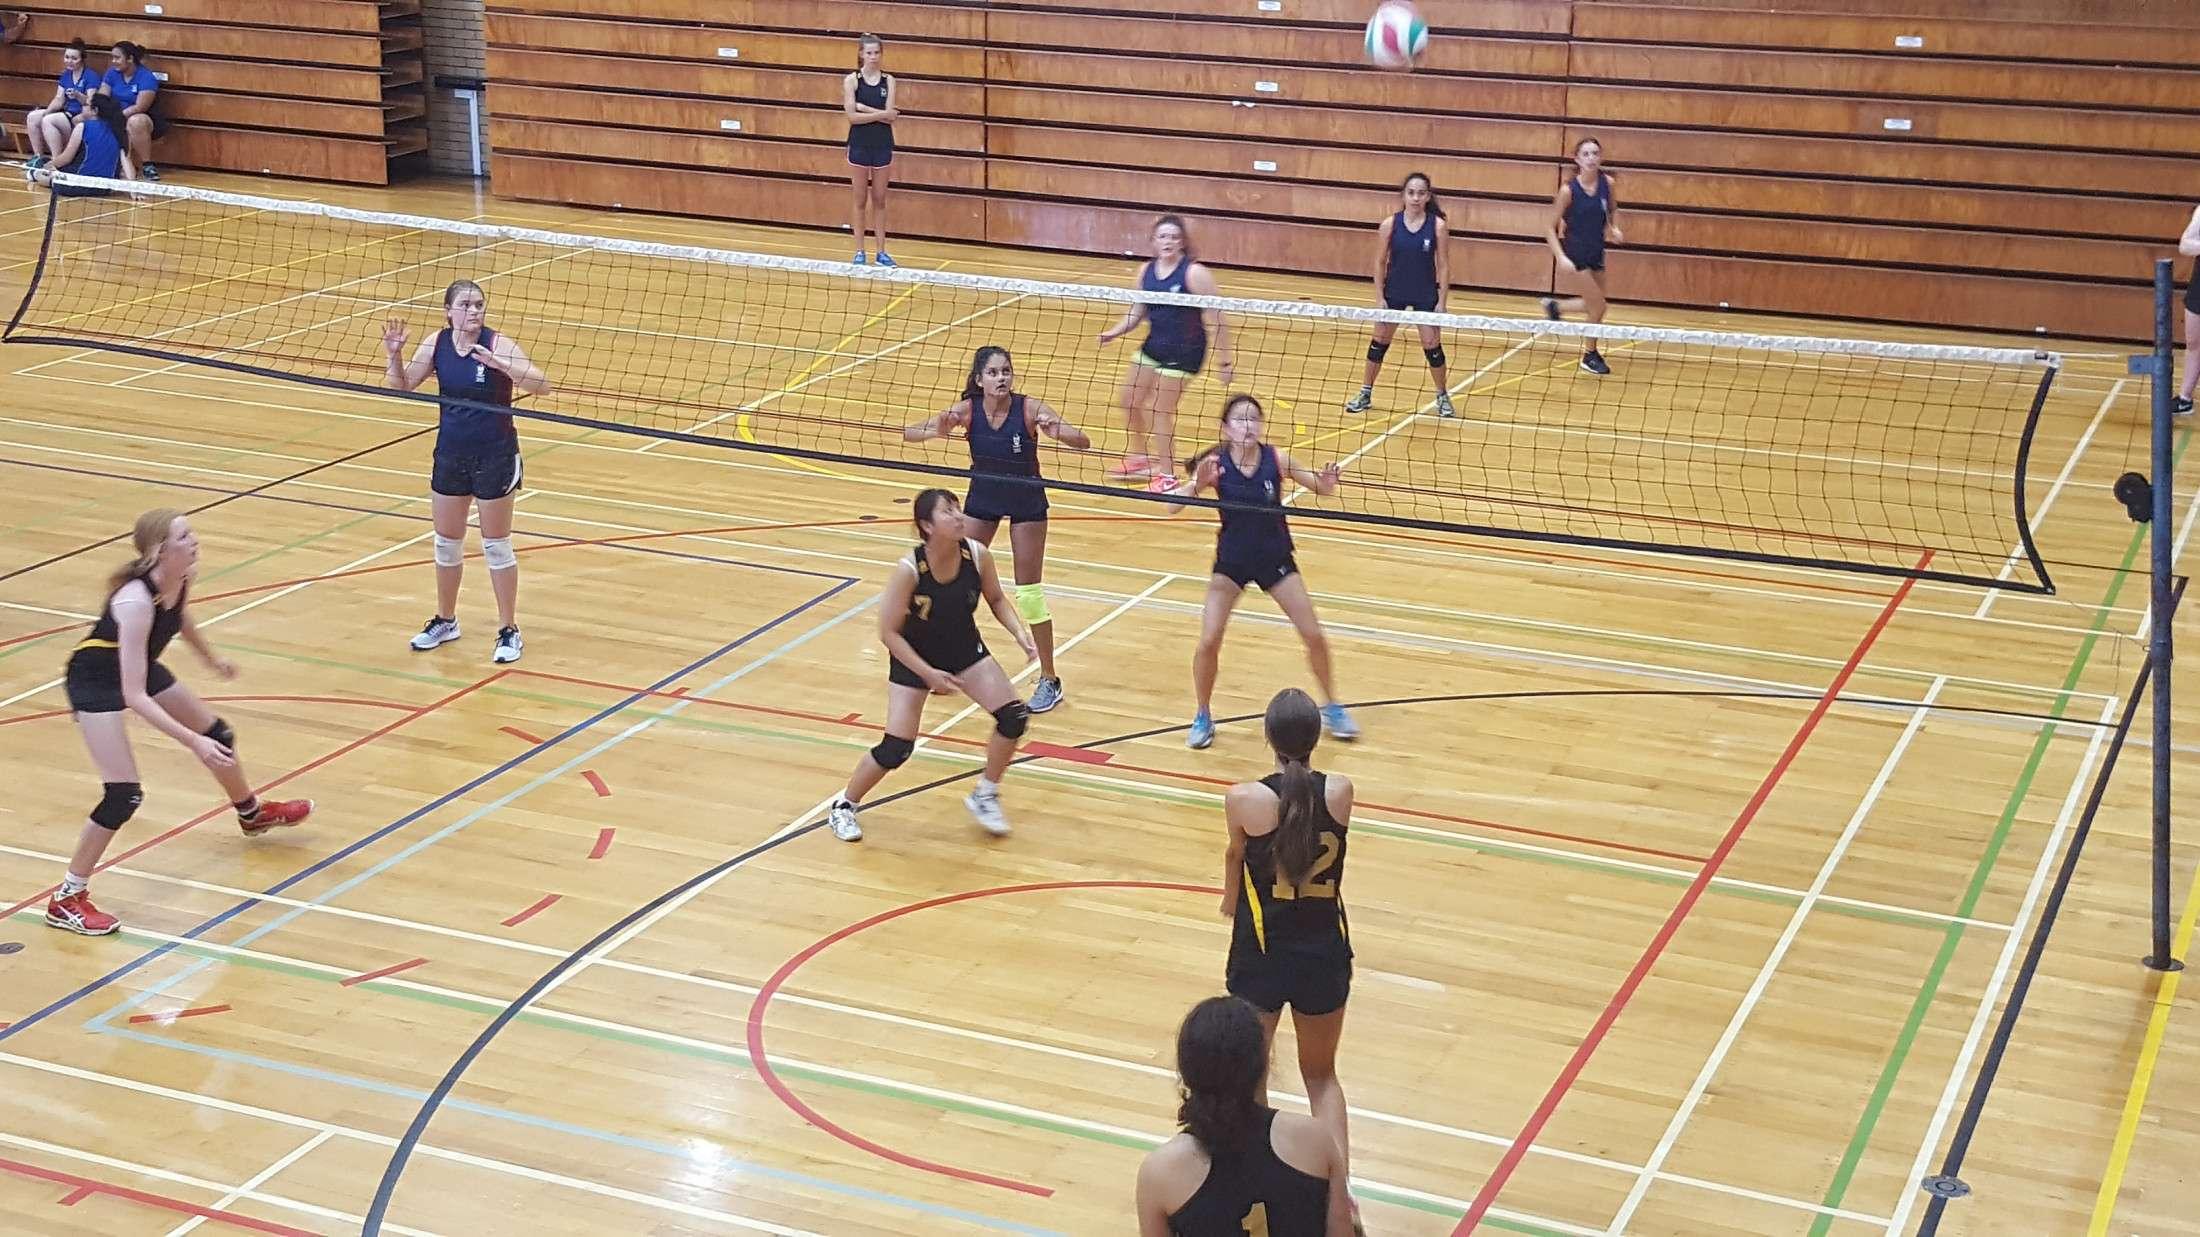 volleyball - sports - sport